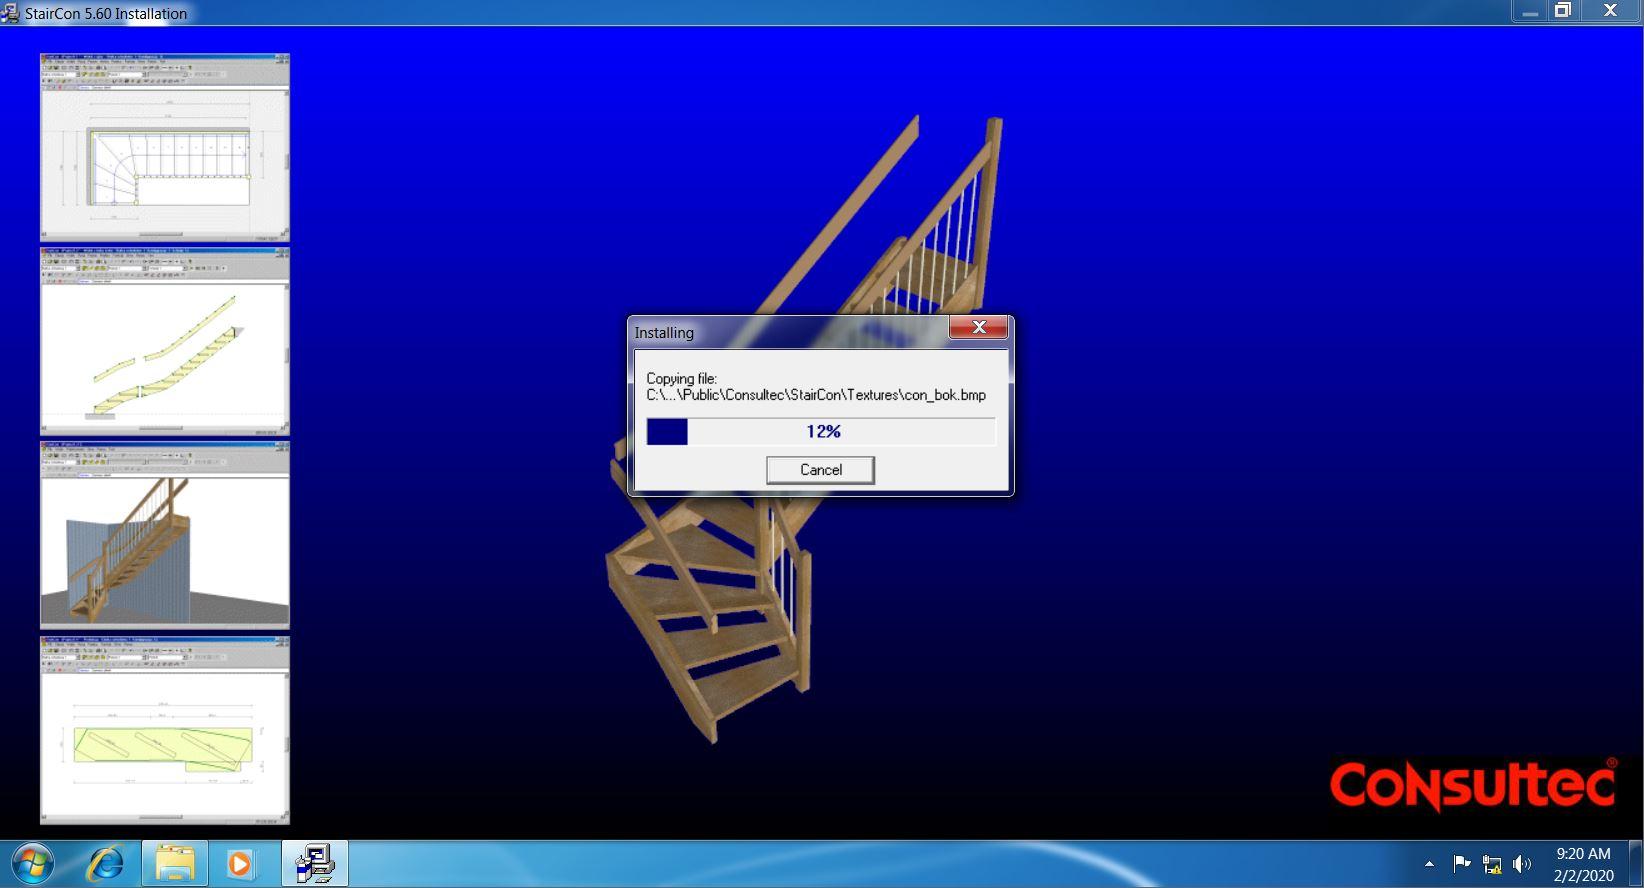 Install StairCon 5.6 full license